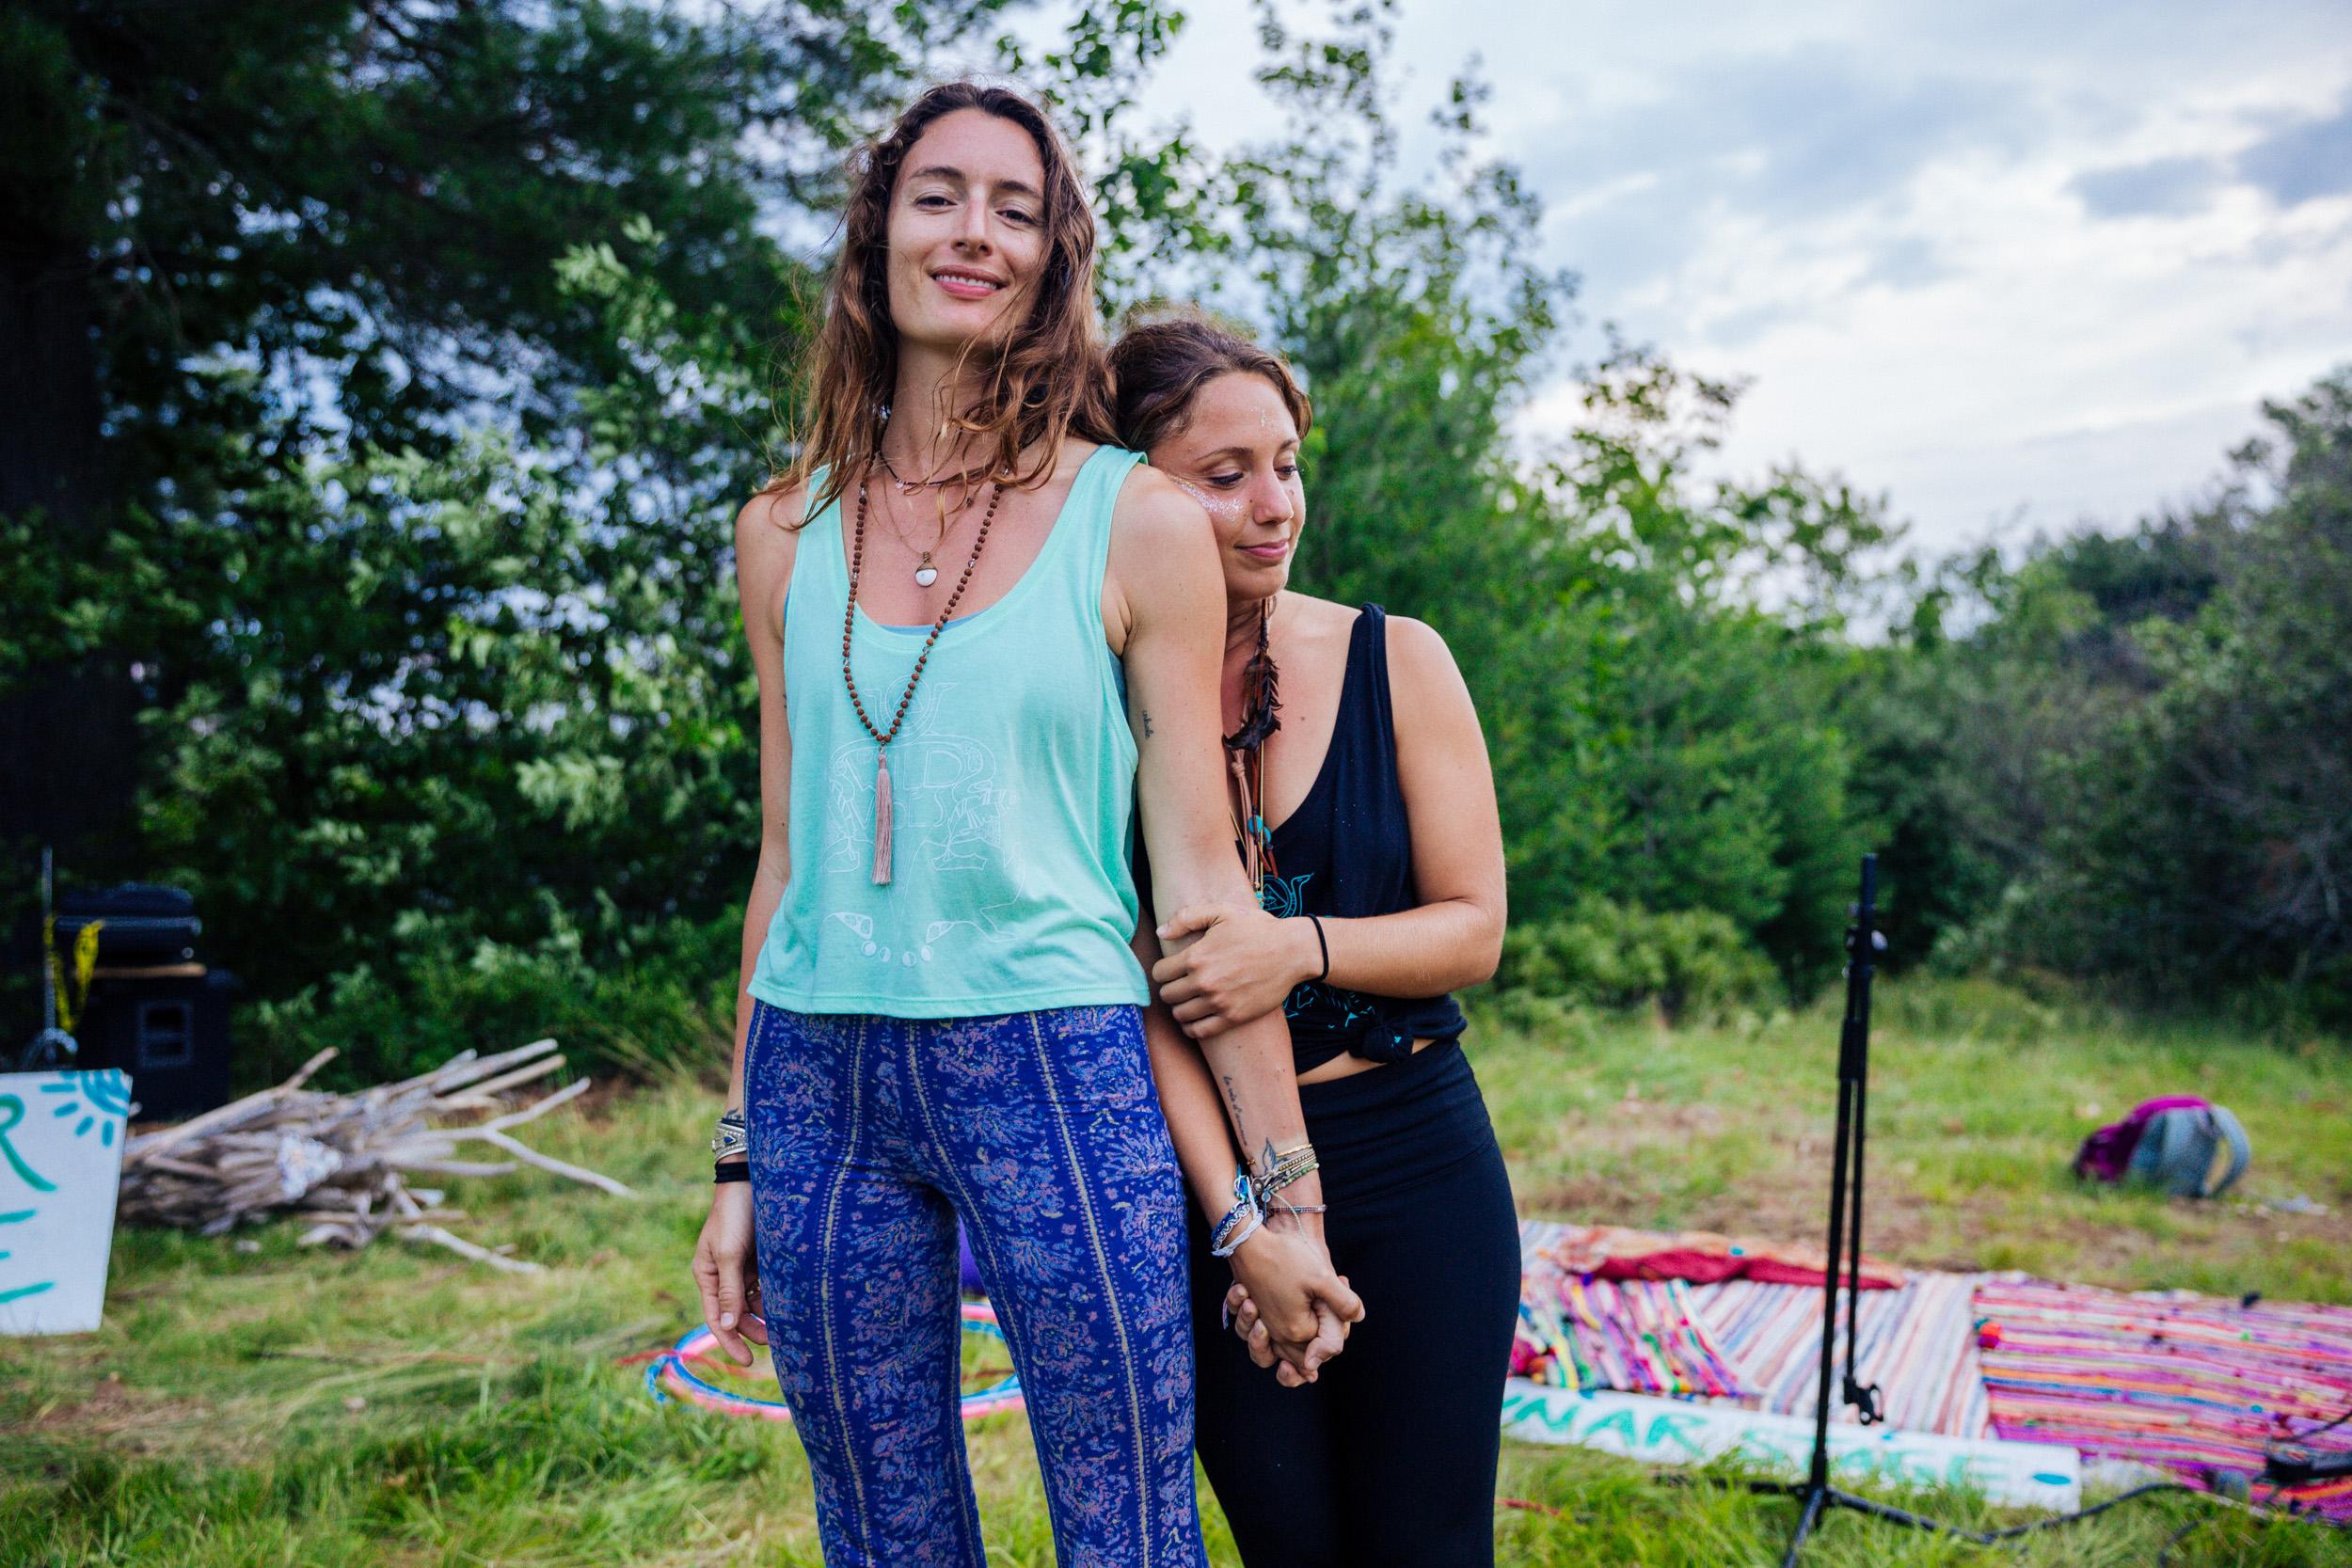 Monica.Justesen.Photography.07.17.Maine.Yoga.Festival.Lifestyle.314.jpg